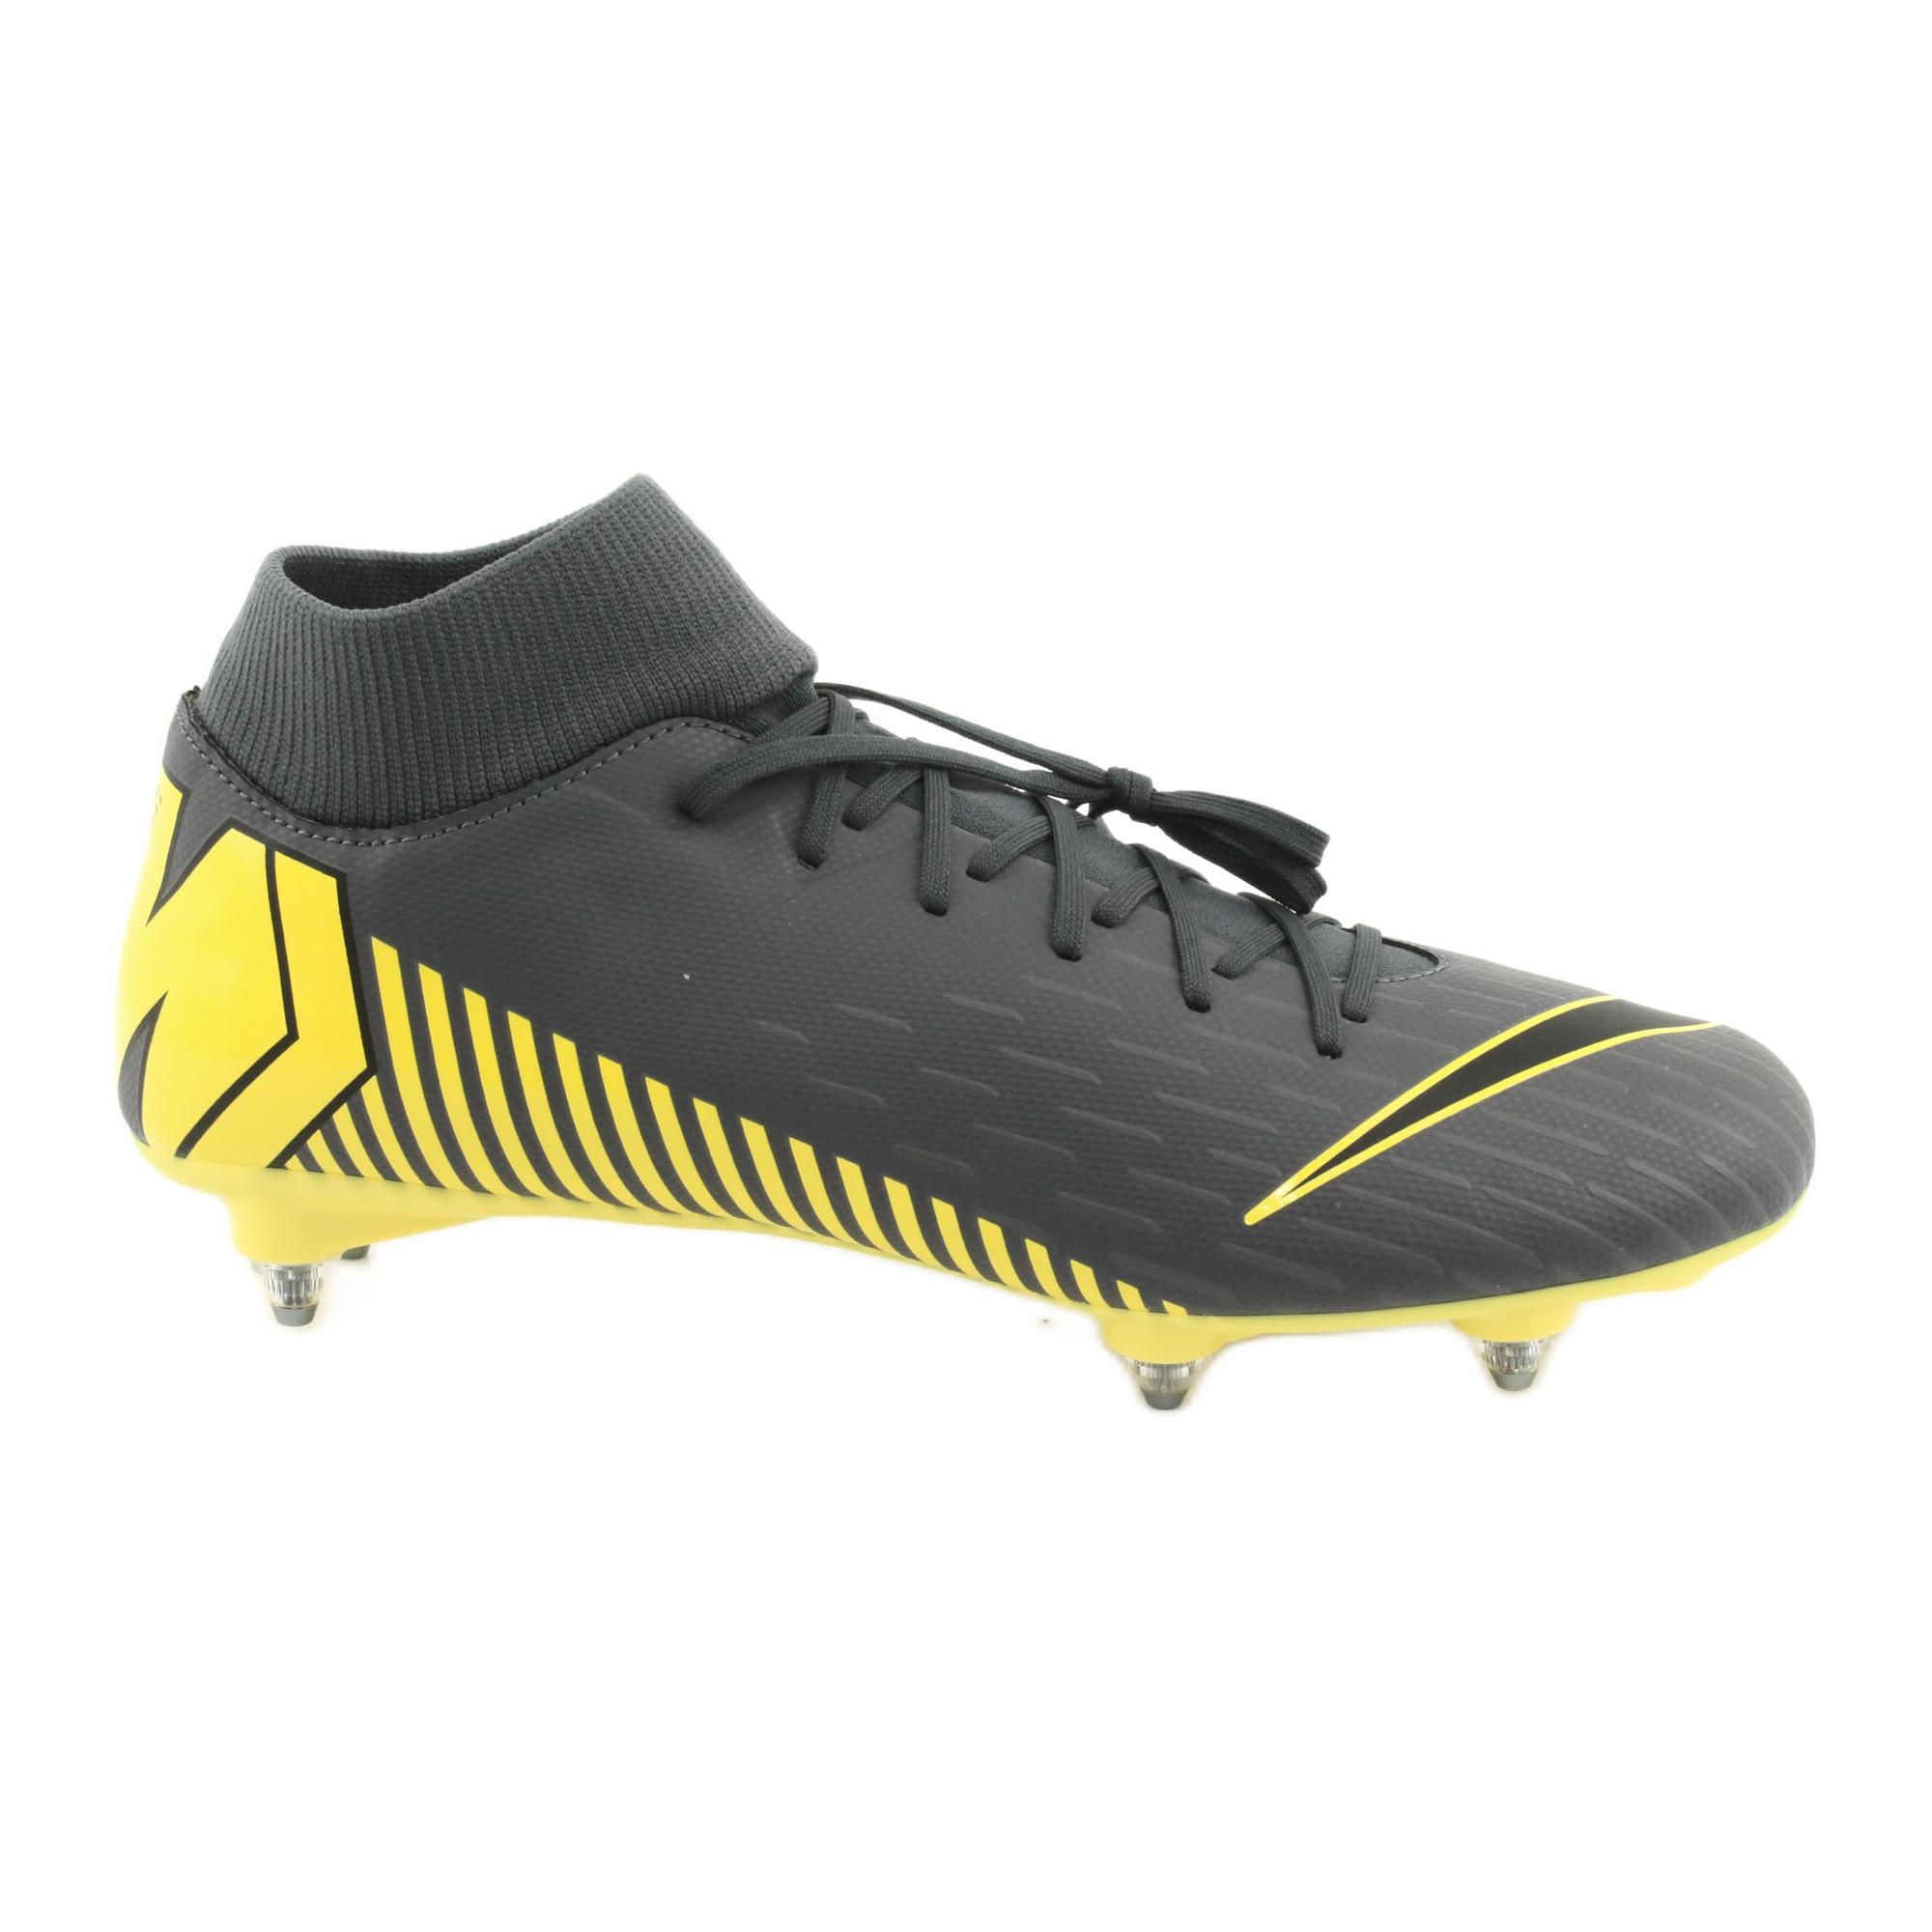 watch f5a2c 94fbc Nike Mercurial Superfly 6 Academy Sg M AH7364-070 Football Shoes